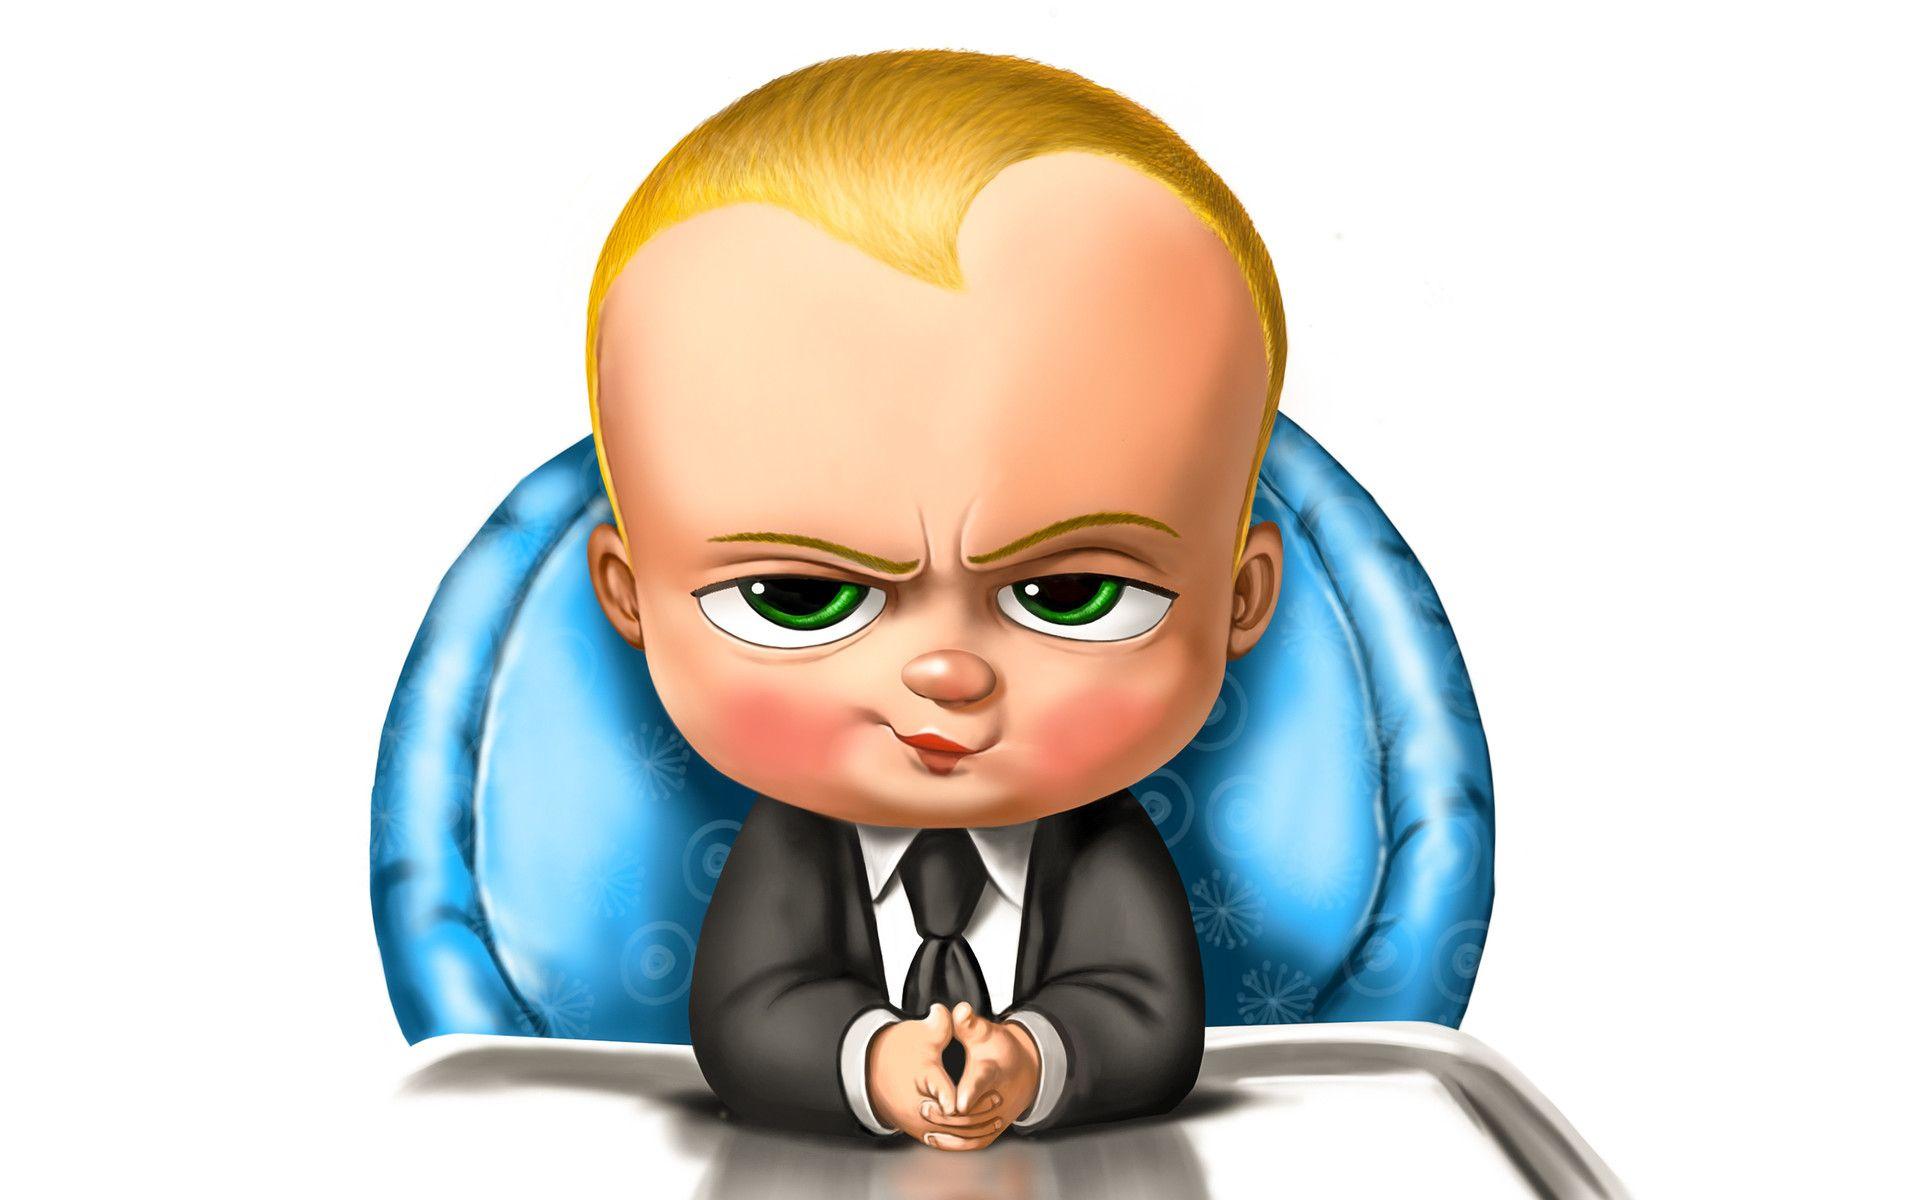 The Boss Baby By Alan Huang C 2017 Disney Character Drawings Baby Cartoon Drawing Boss Baby